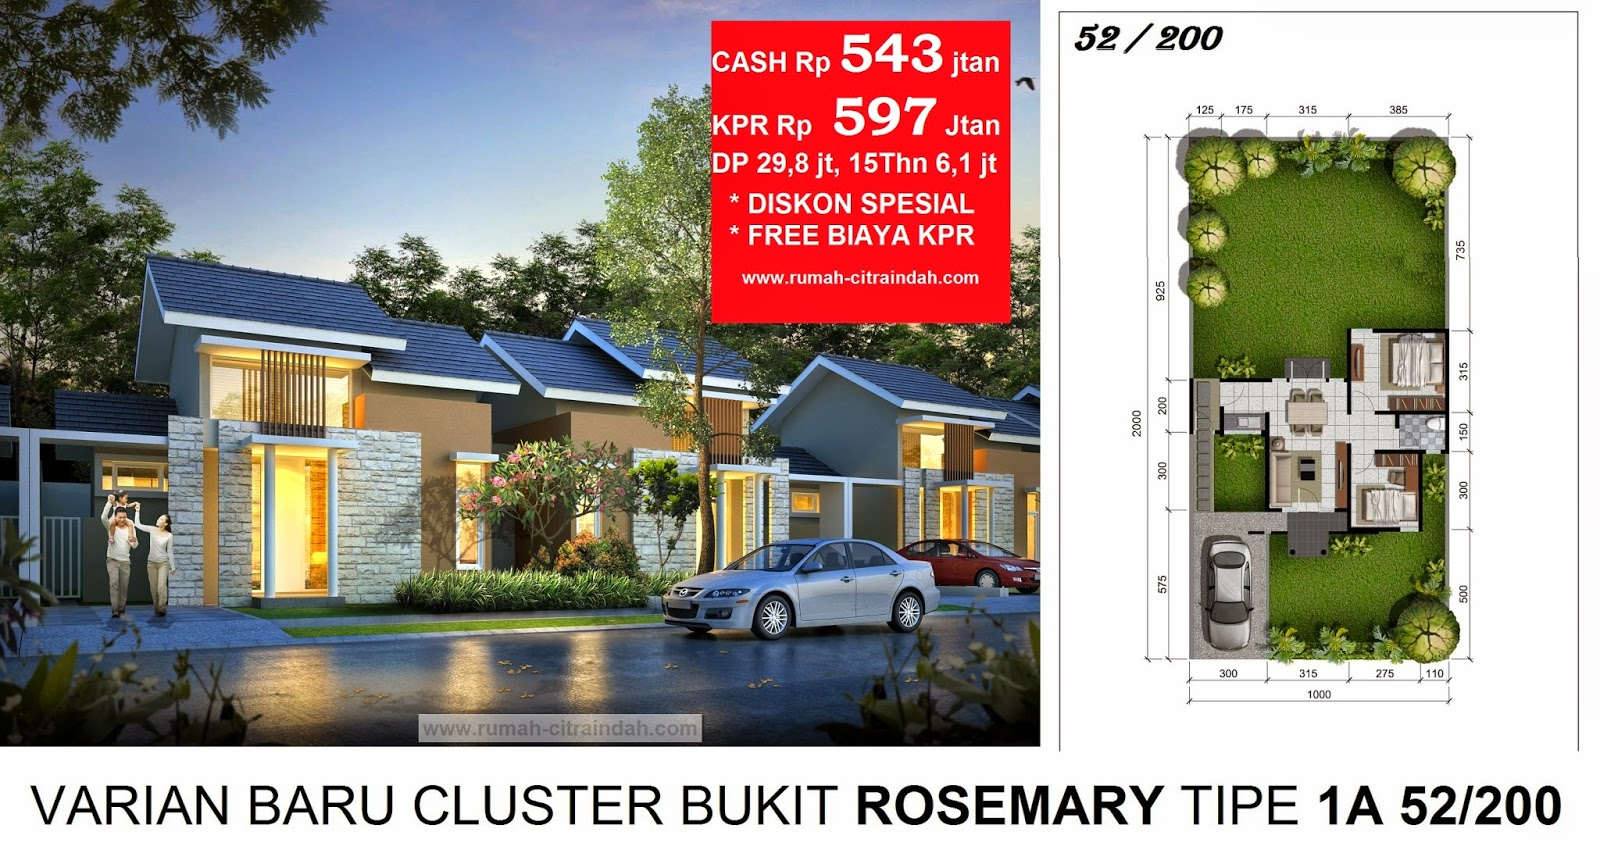 rosemary-52-200-citra-indah